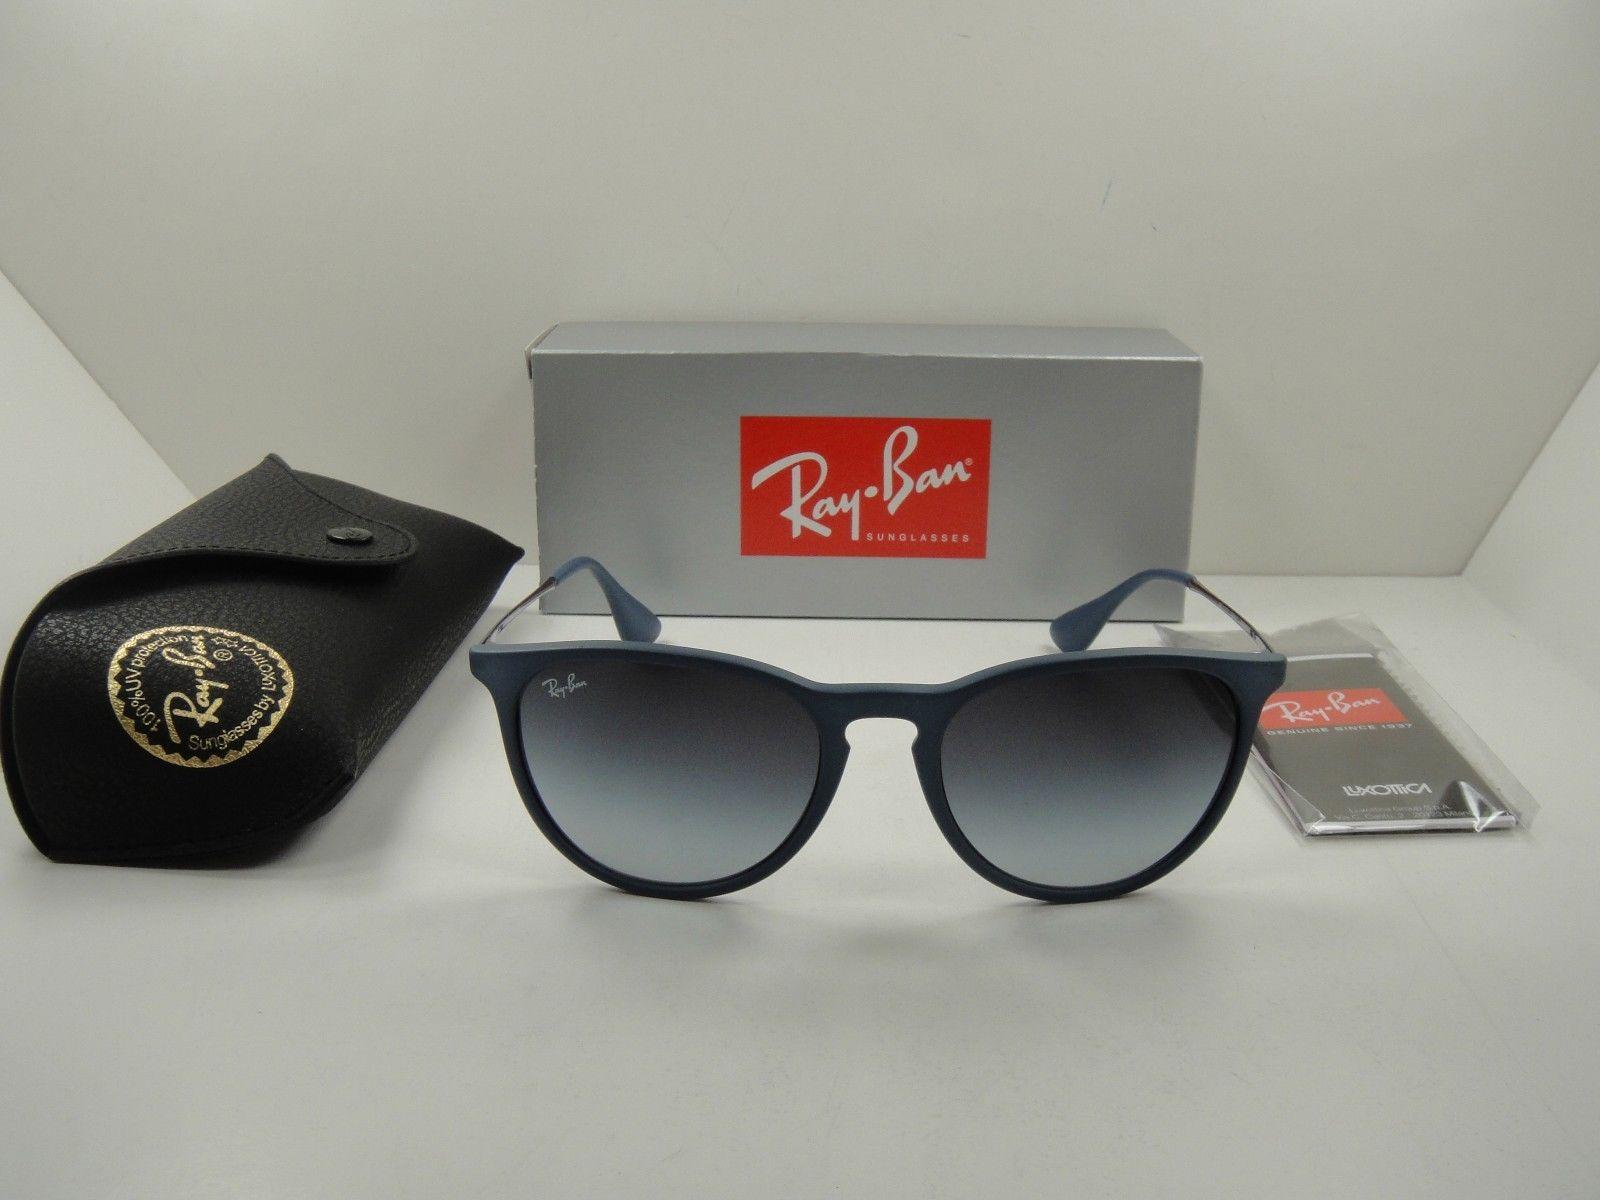 RayBan Erika RB4171F 60028G BLUE FRAME/GRAY GRADIENT